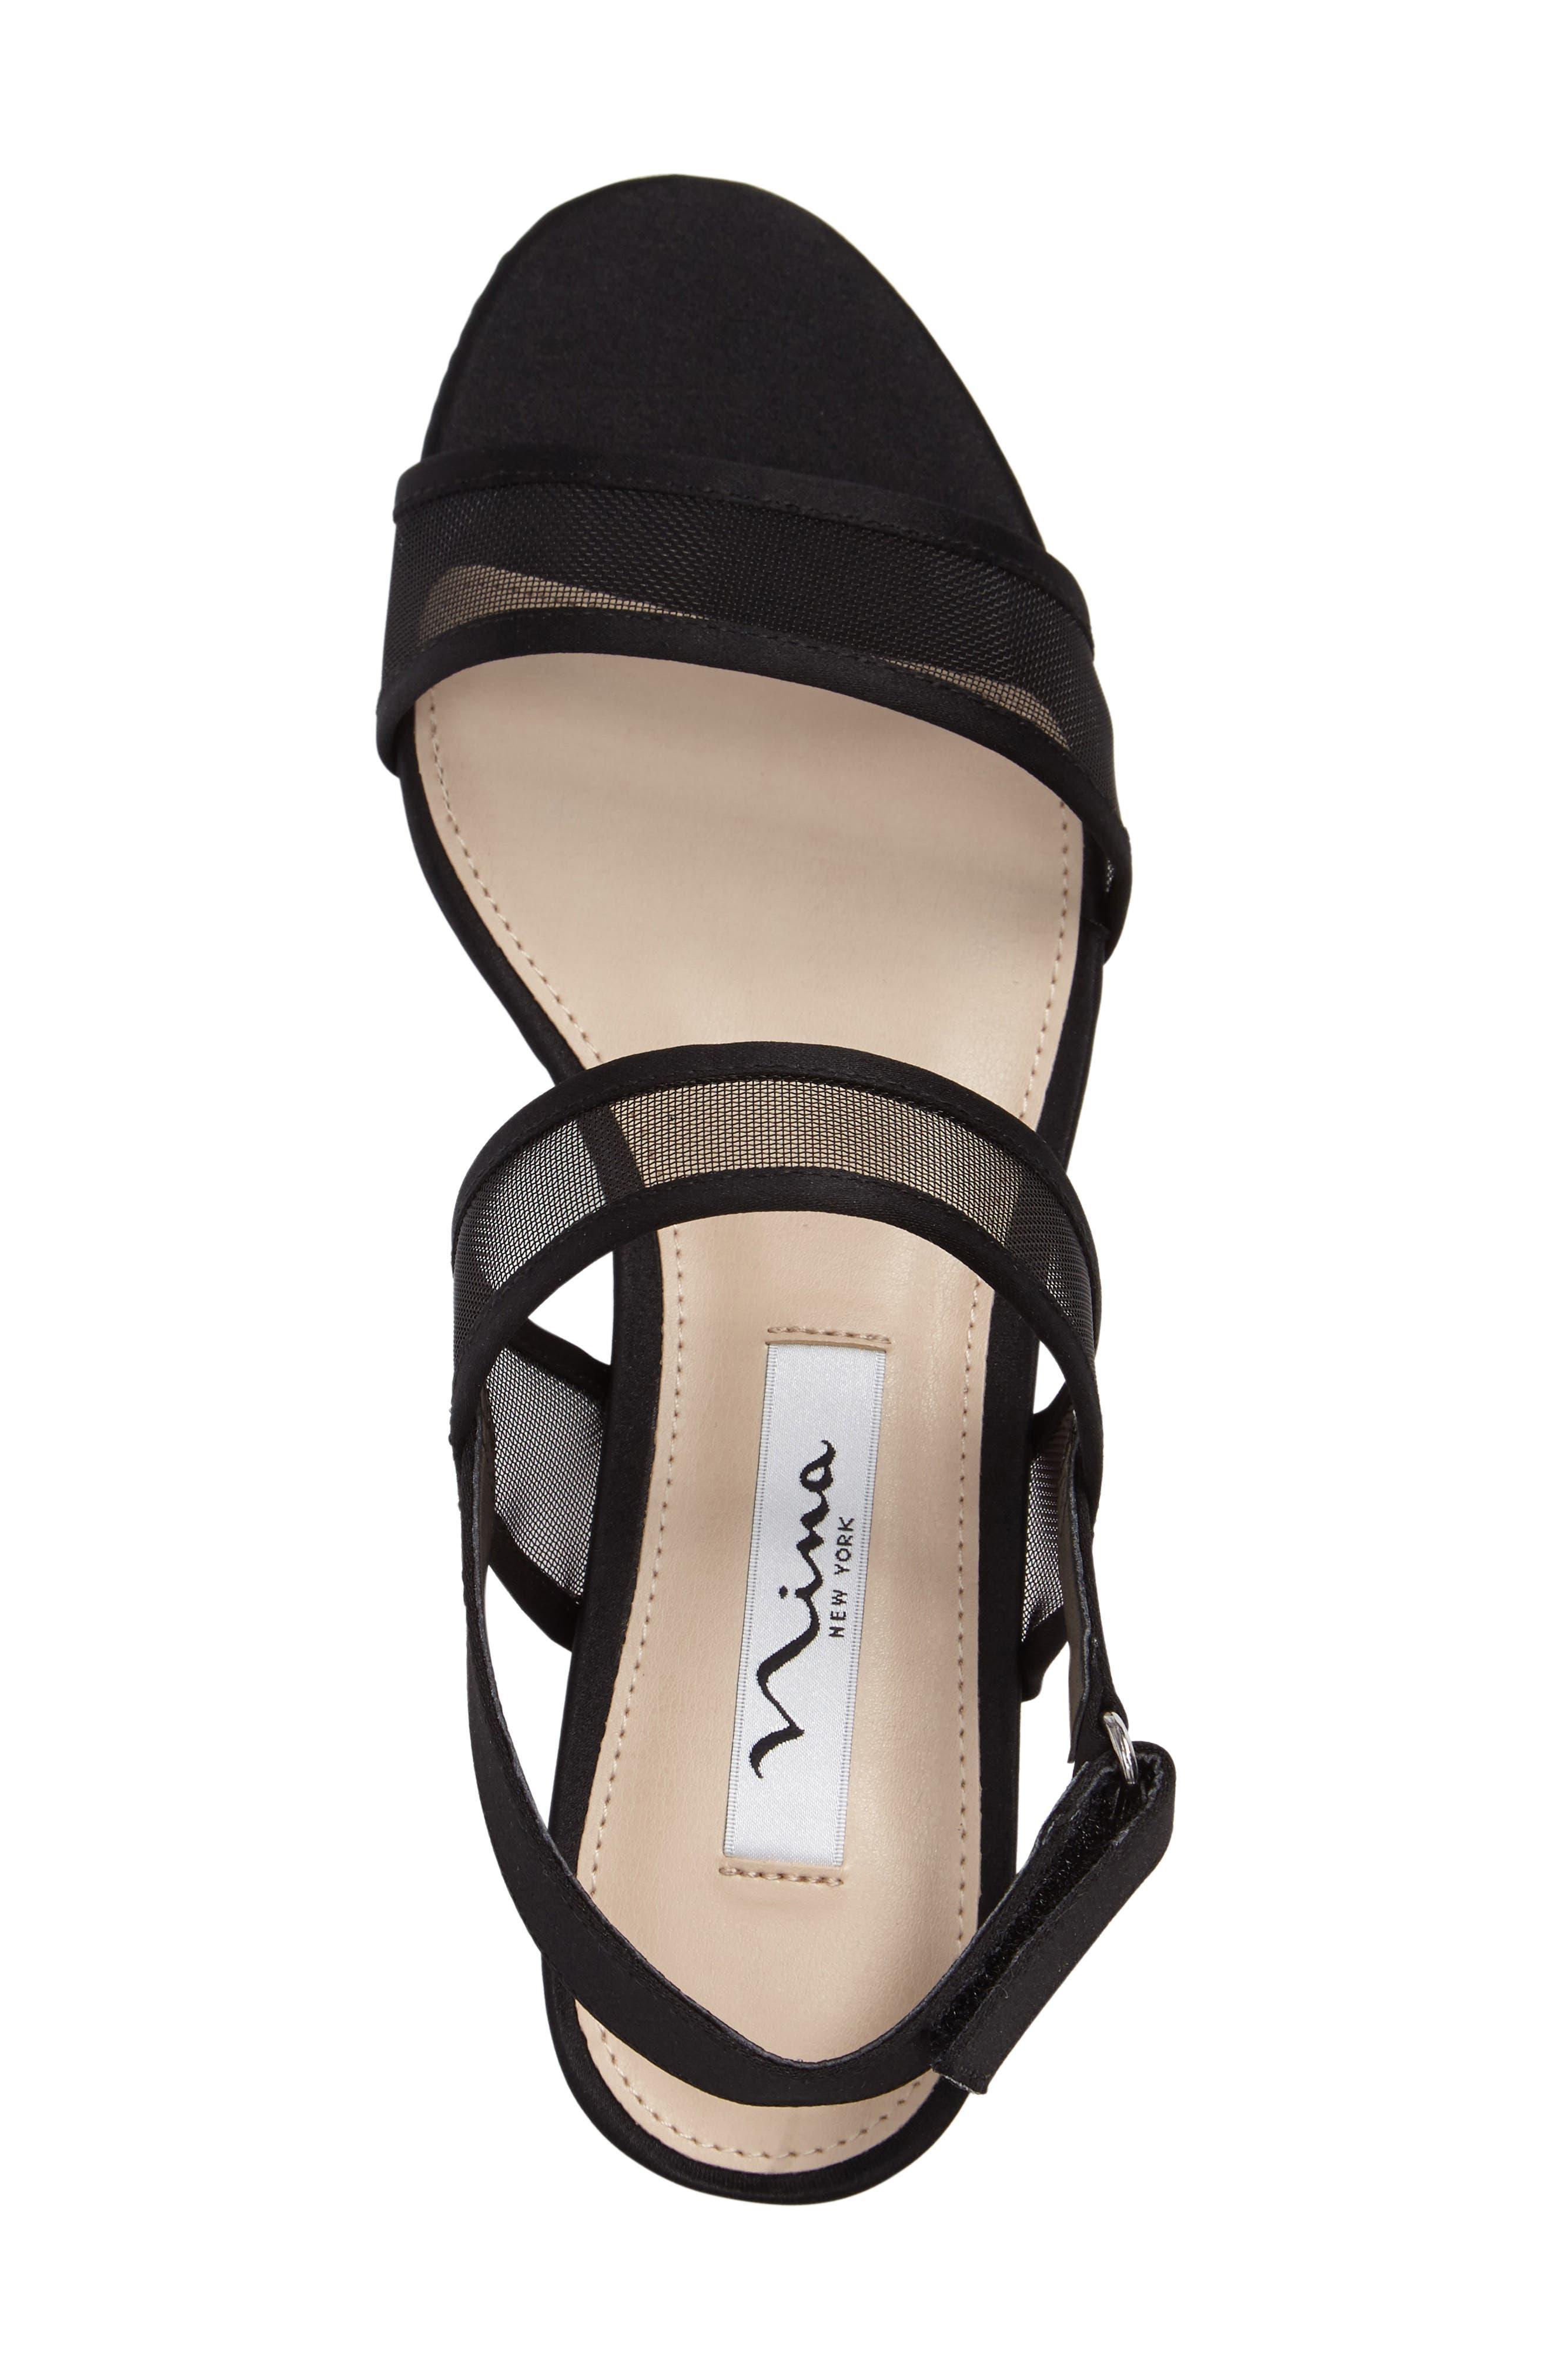 NINA, Ganice Mesh Strap Sandal, Alternate thumbnail 3, color, BLACK SATIN